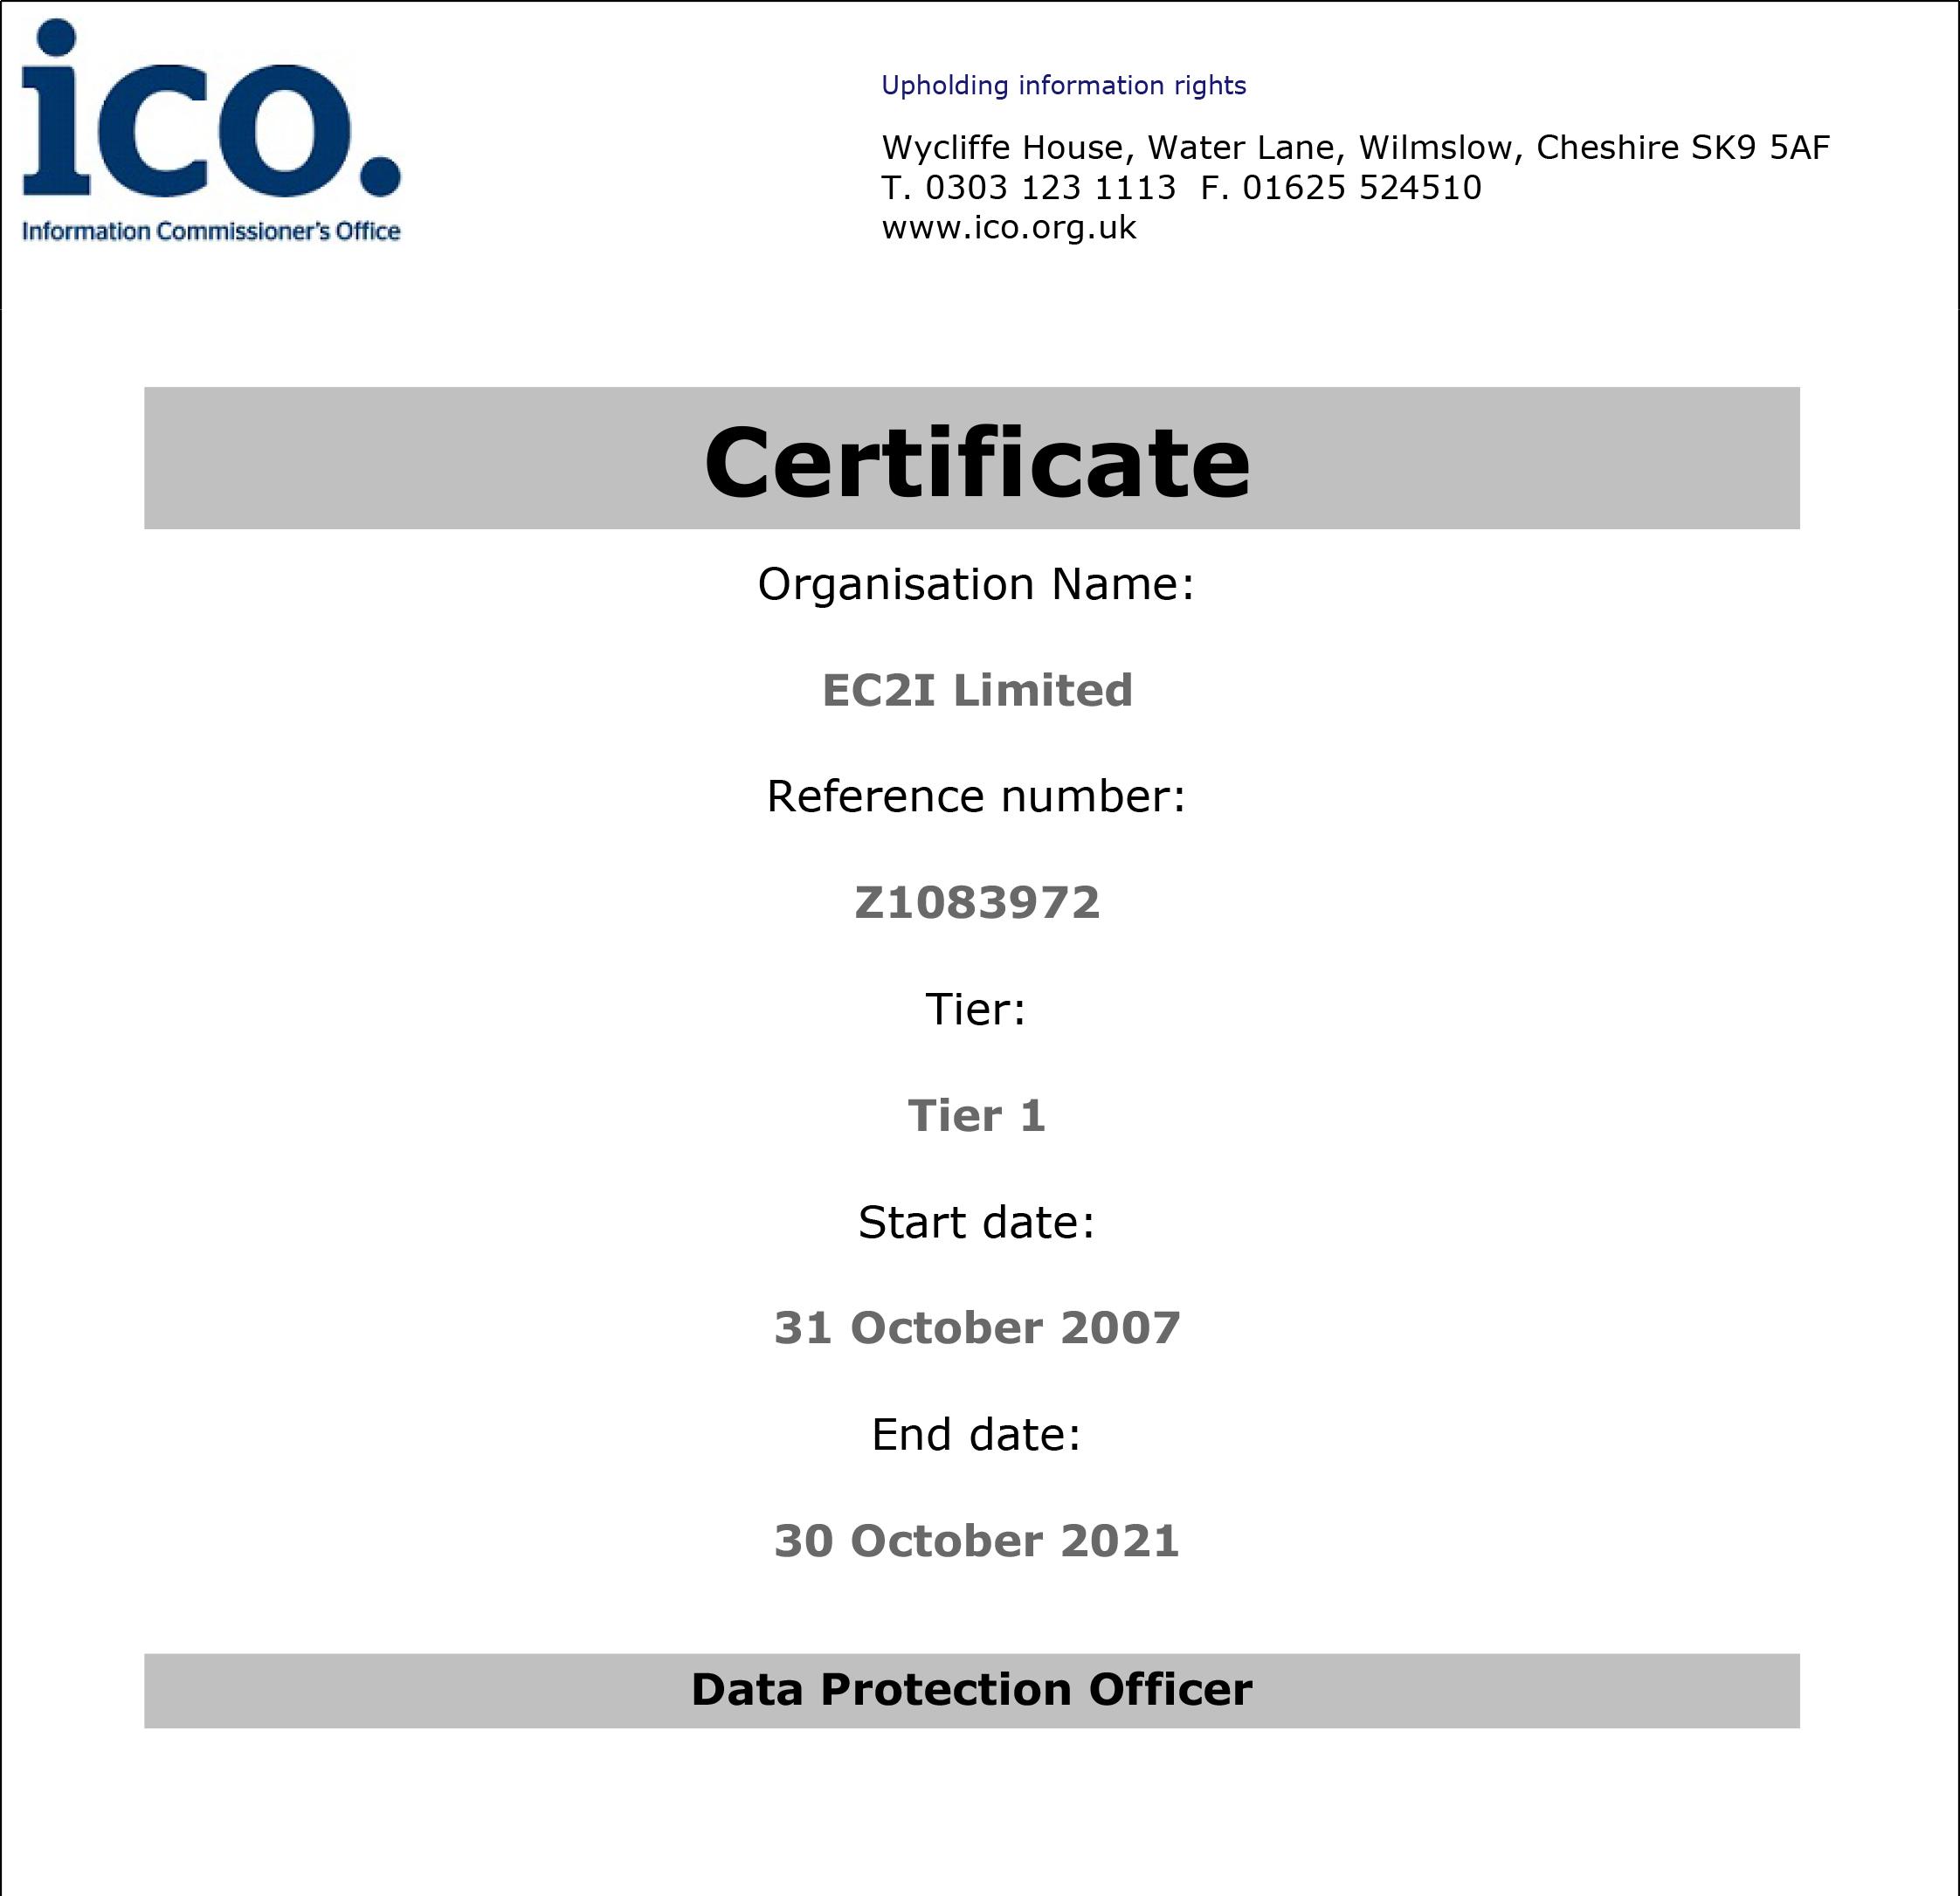 ICO Registration Certificate 2021-1